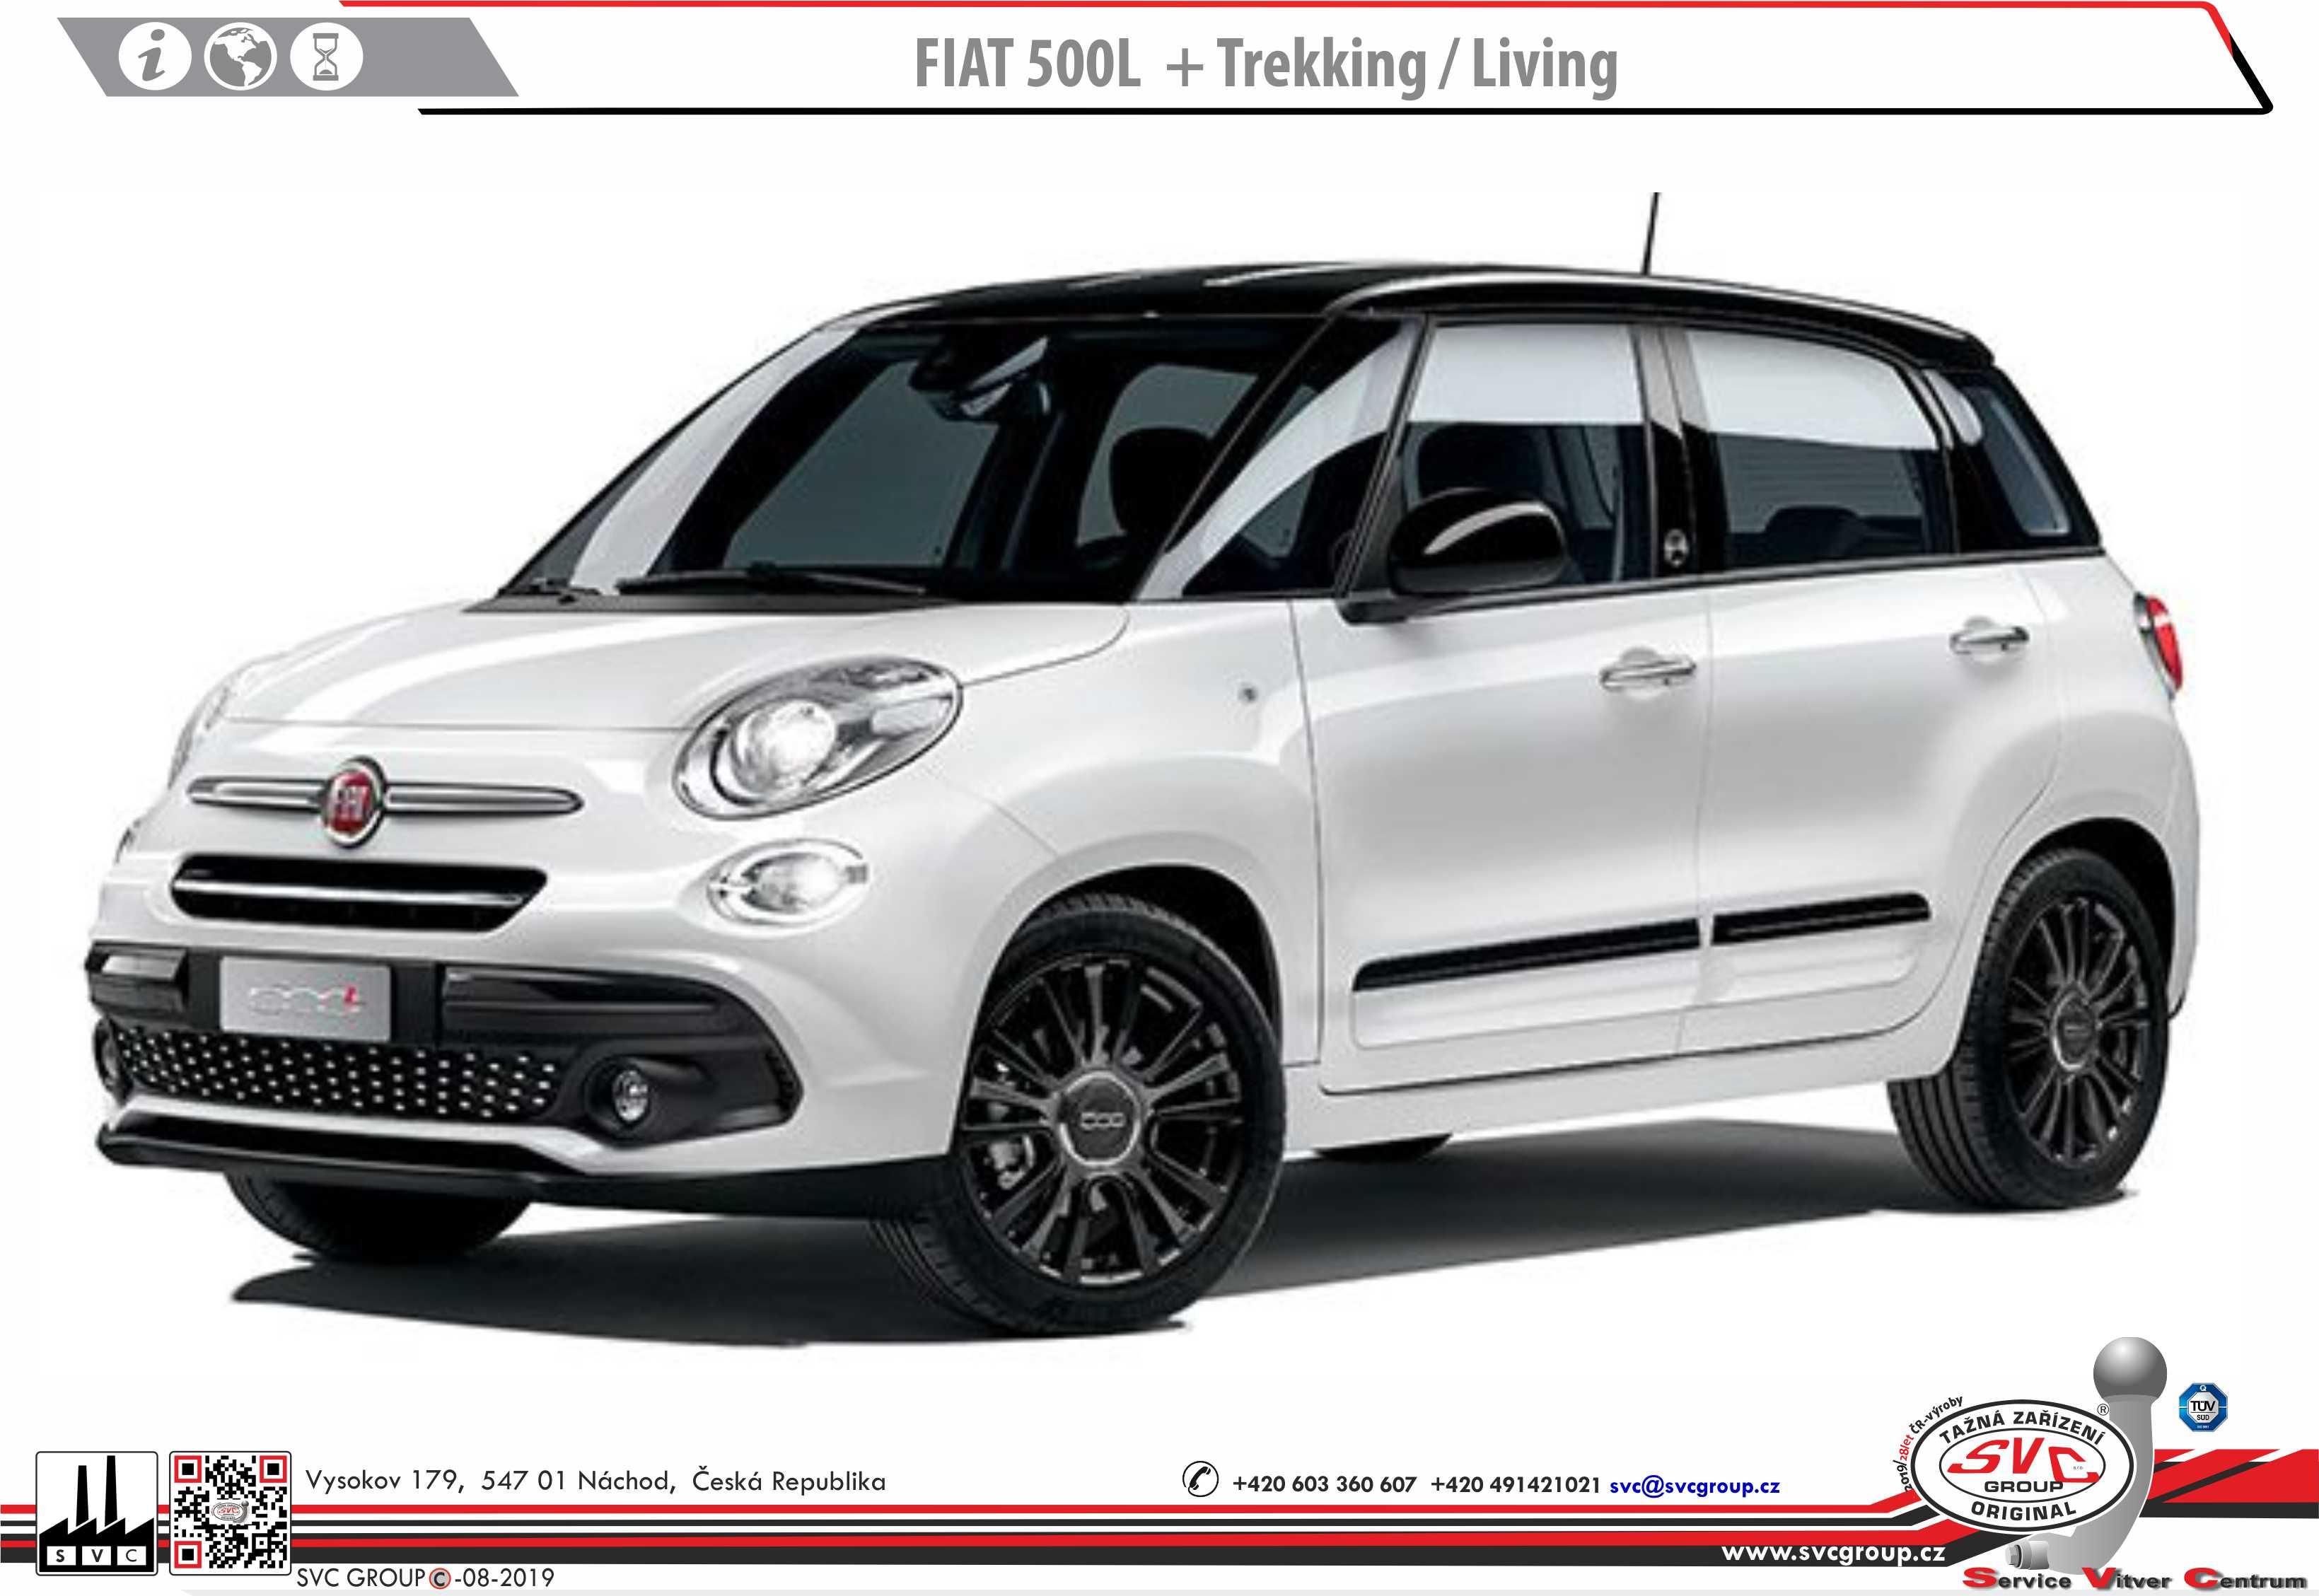 Fiat 500L + Trekking /  Living